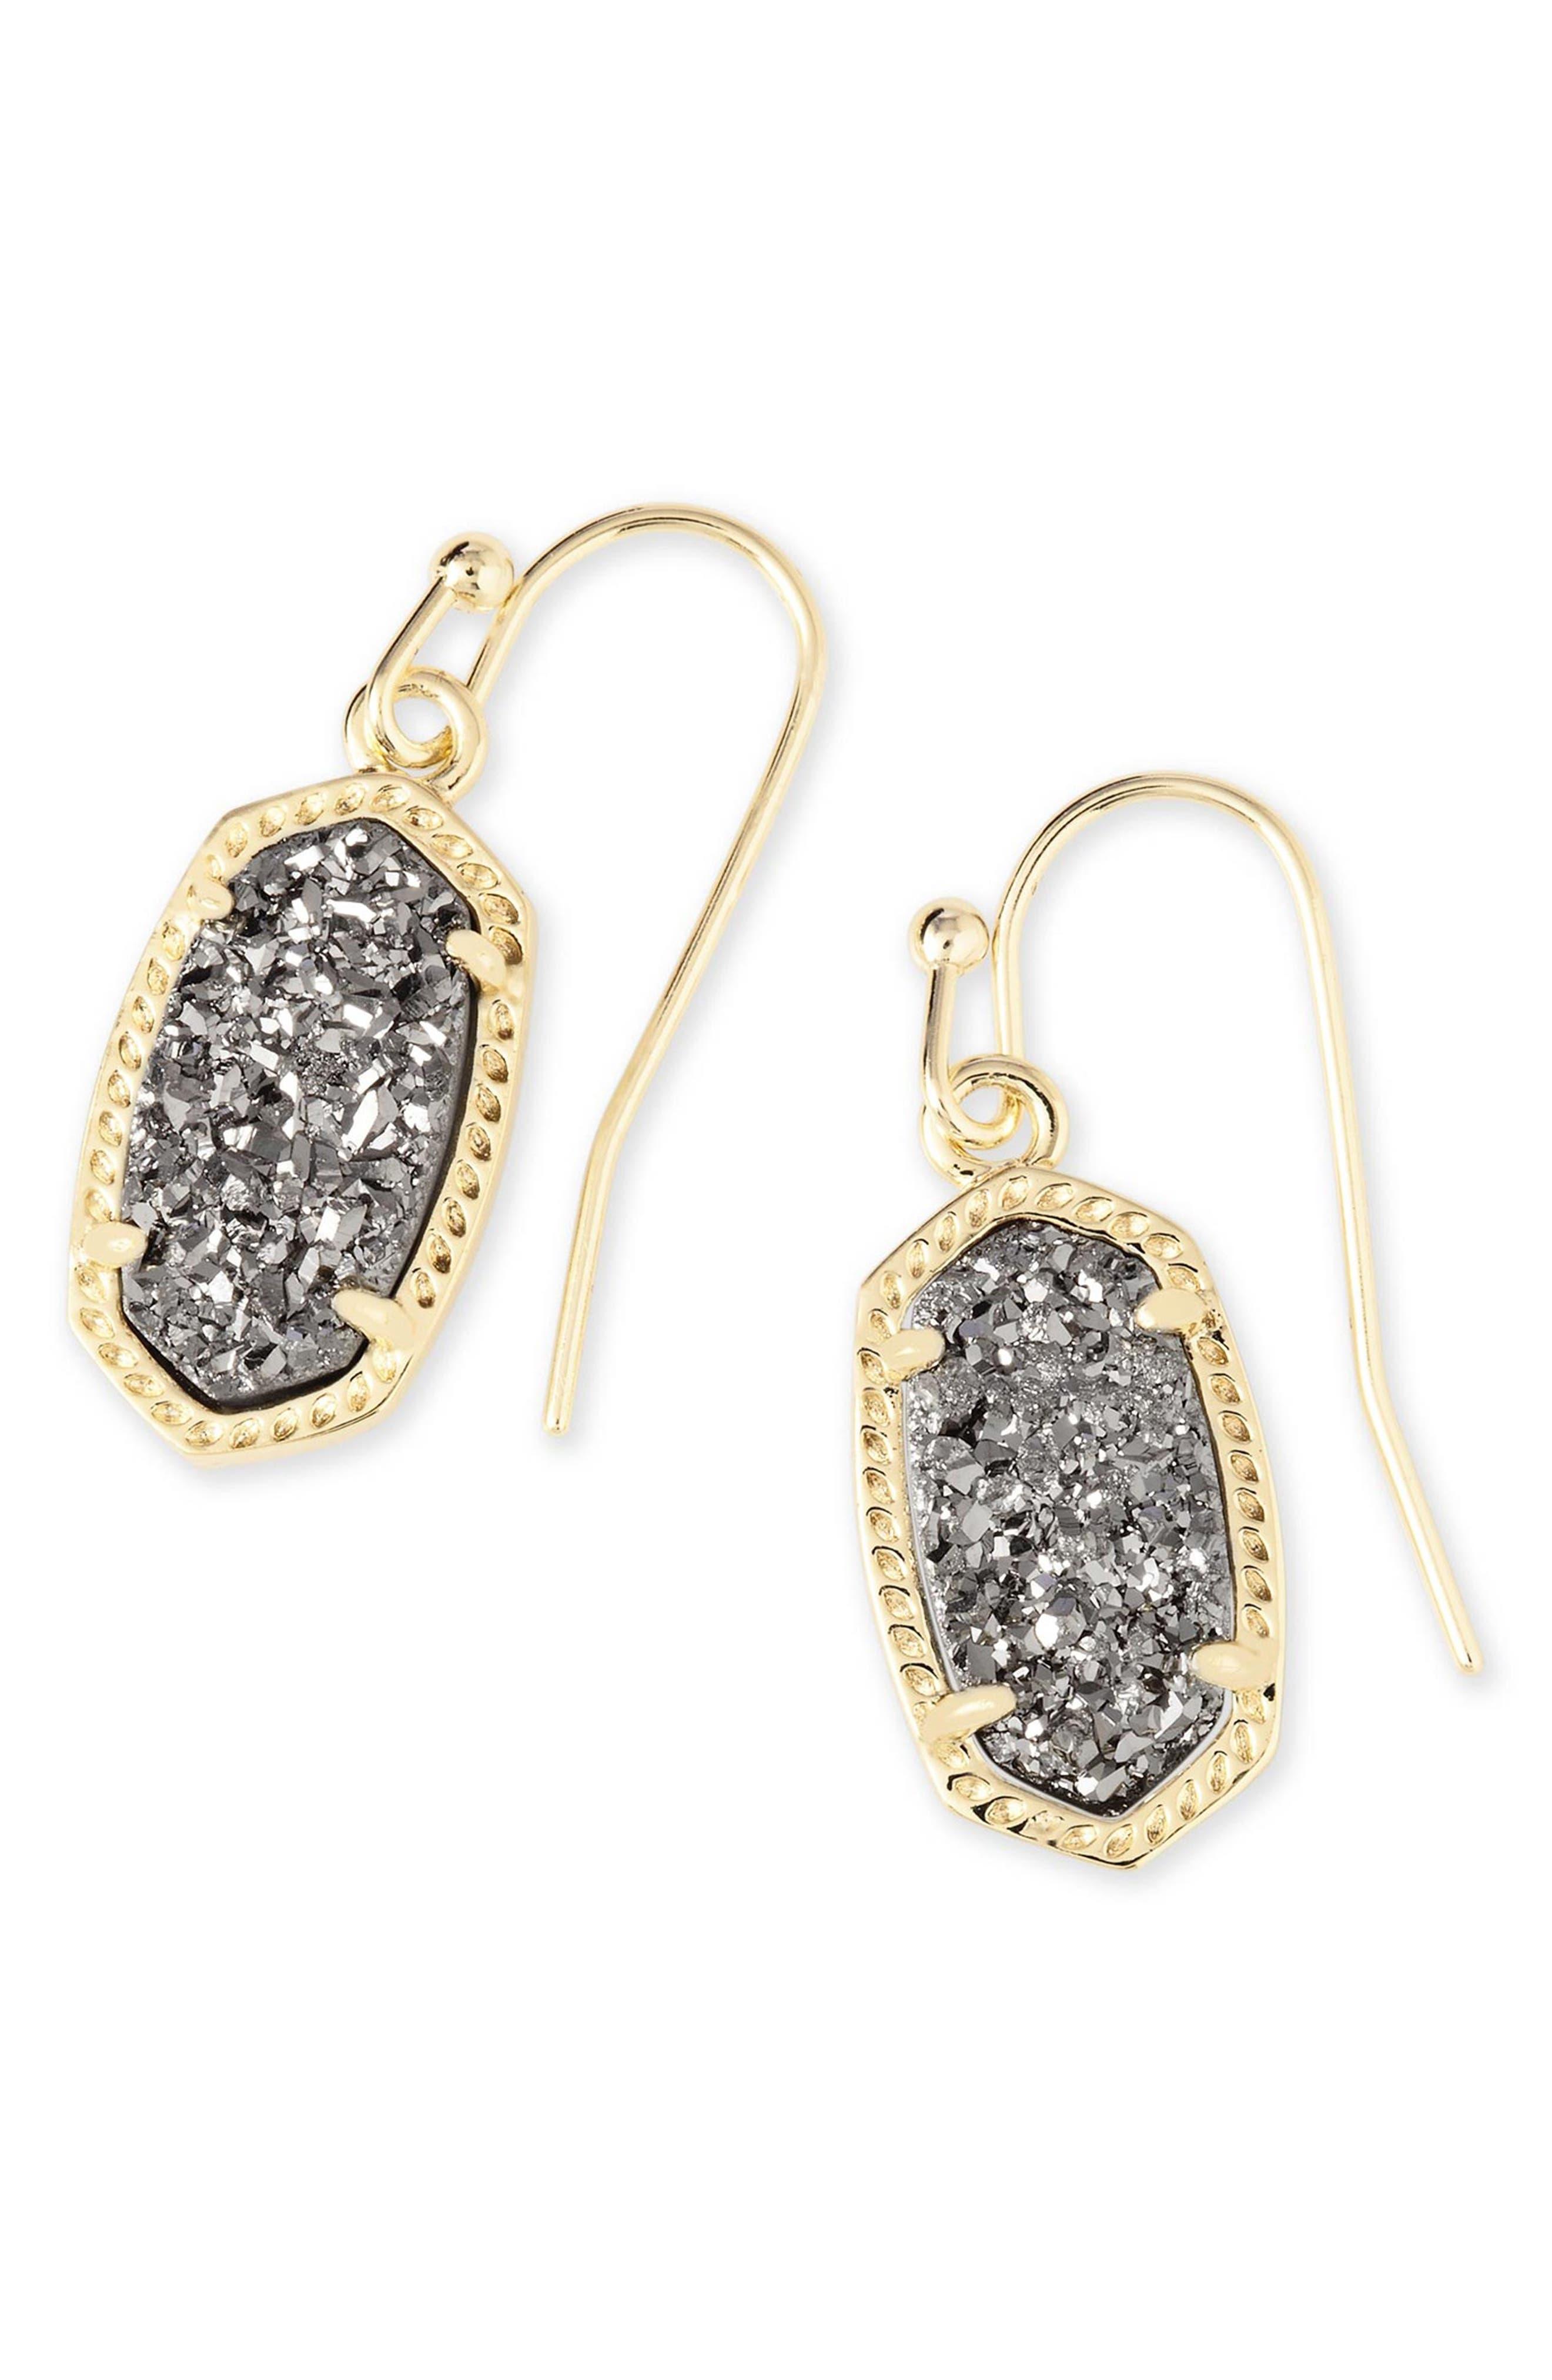 KENDRA SCOTT Lee Small Drop Earrings, Main, color, PLATINUM DRUSY/ GOLD